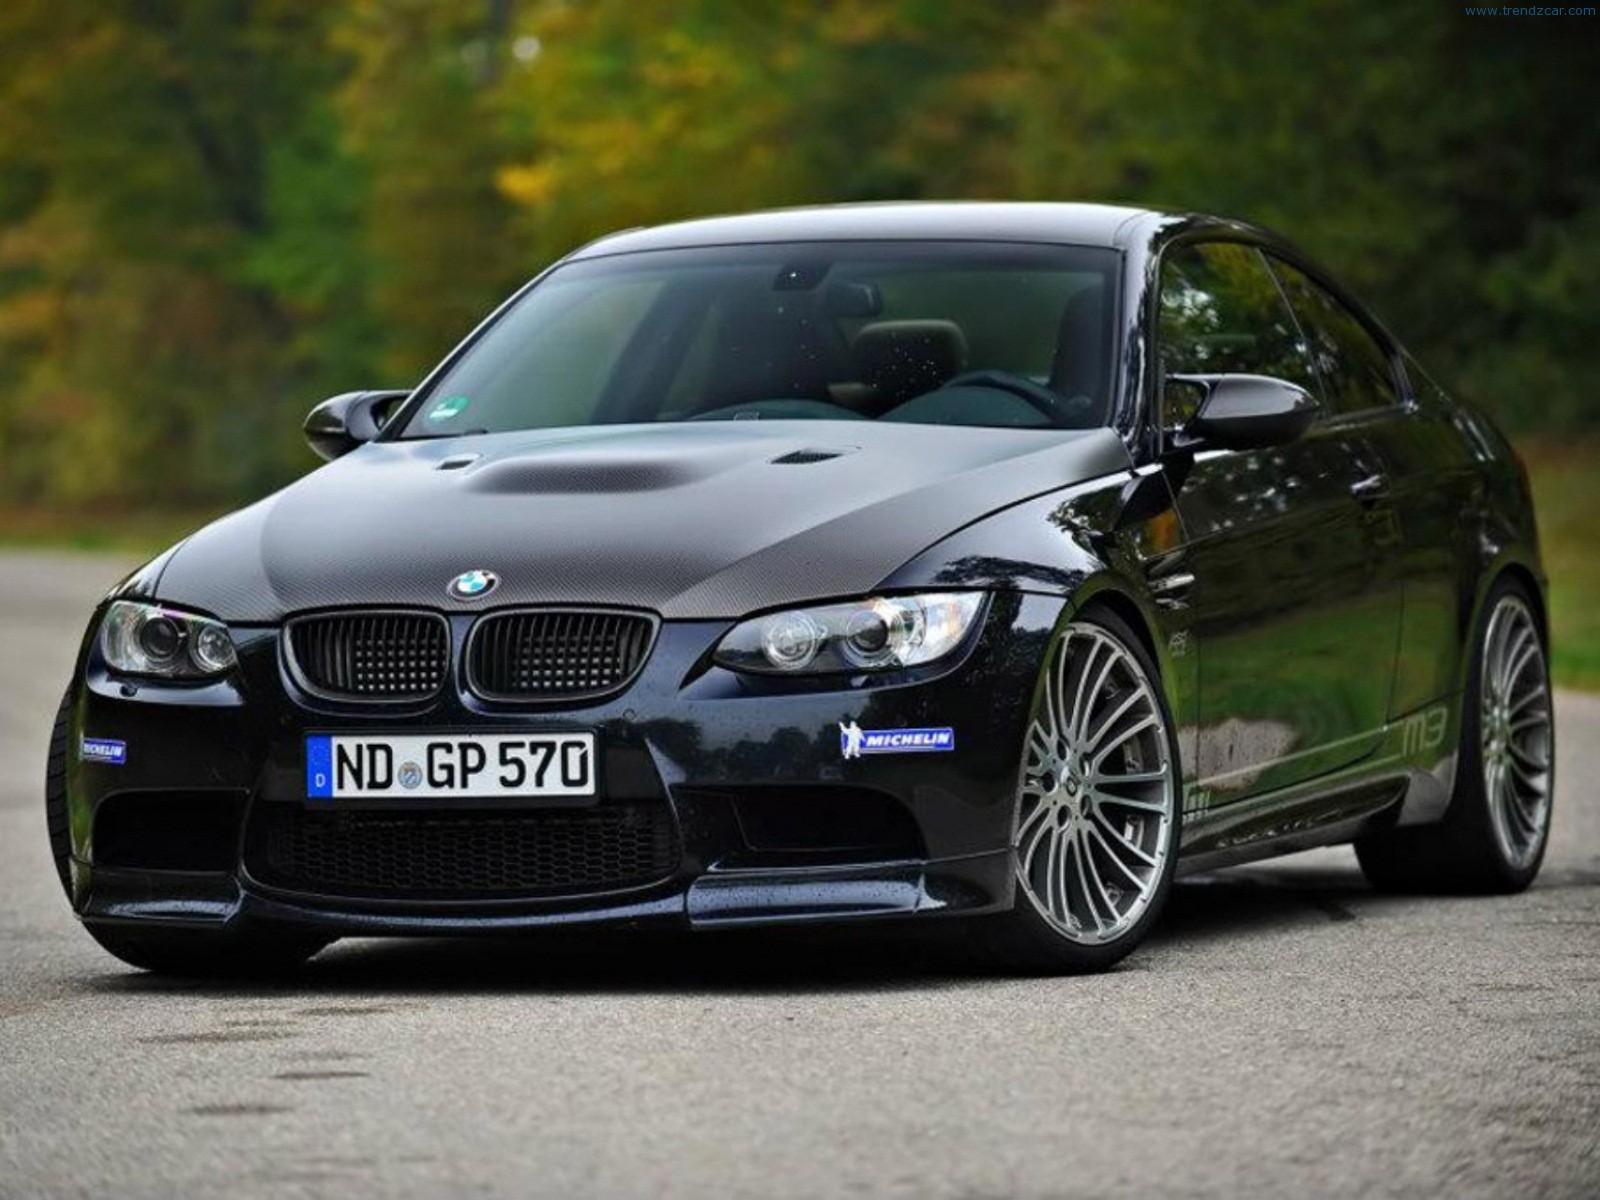 BMW M3 Wallpaper HD Widescreen 1600x1200